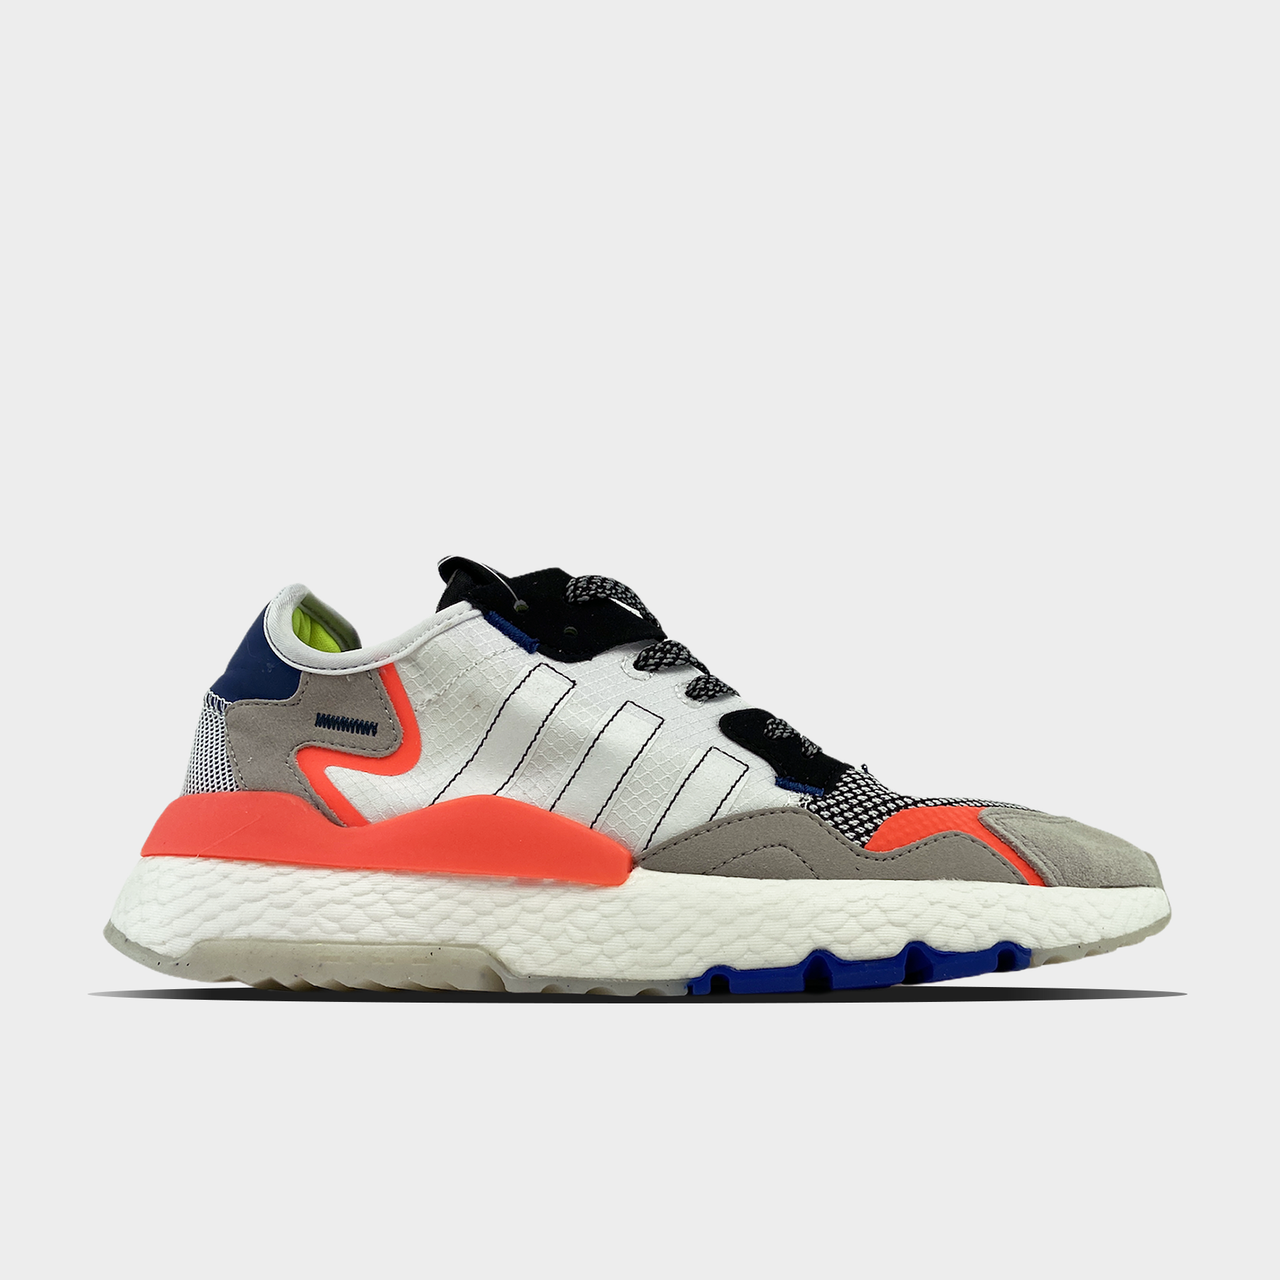 Ad!id@s, крос, обувь, взуття, sneakers, шузы, Nite Jogger Grey Orange (Белый)